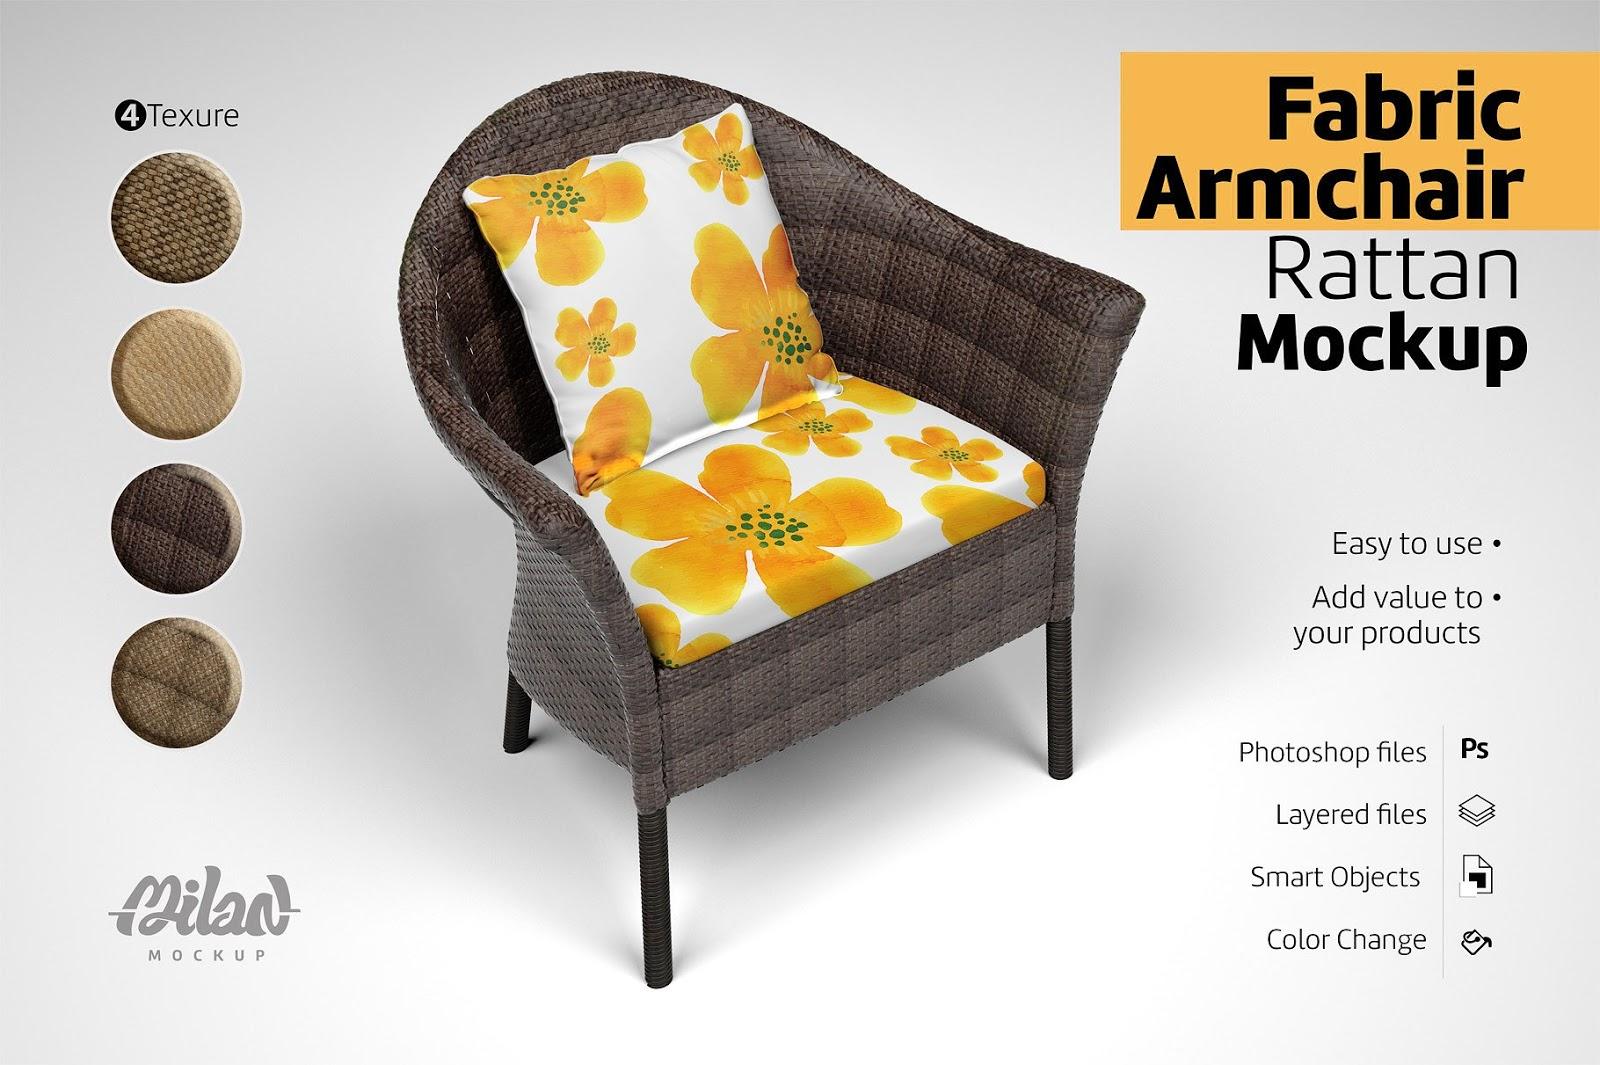 Fabric Armchair Rattan Mockup